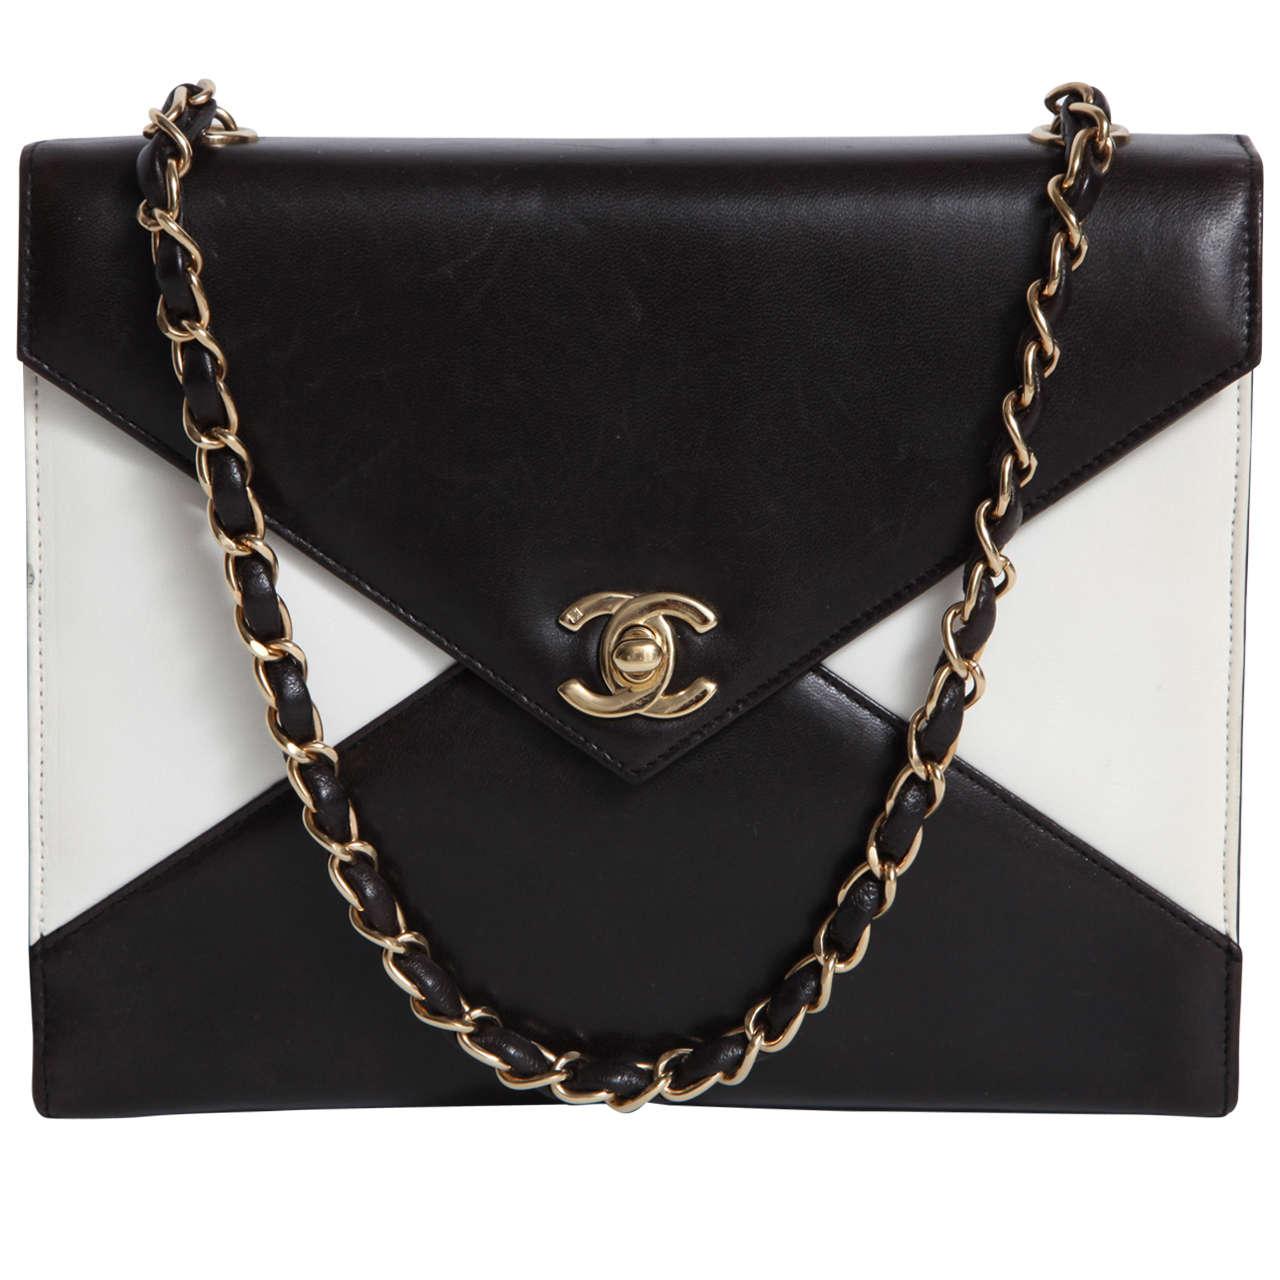 Vintage Chanel Black and White Handbag 1